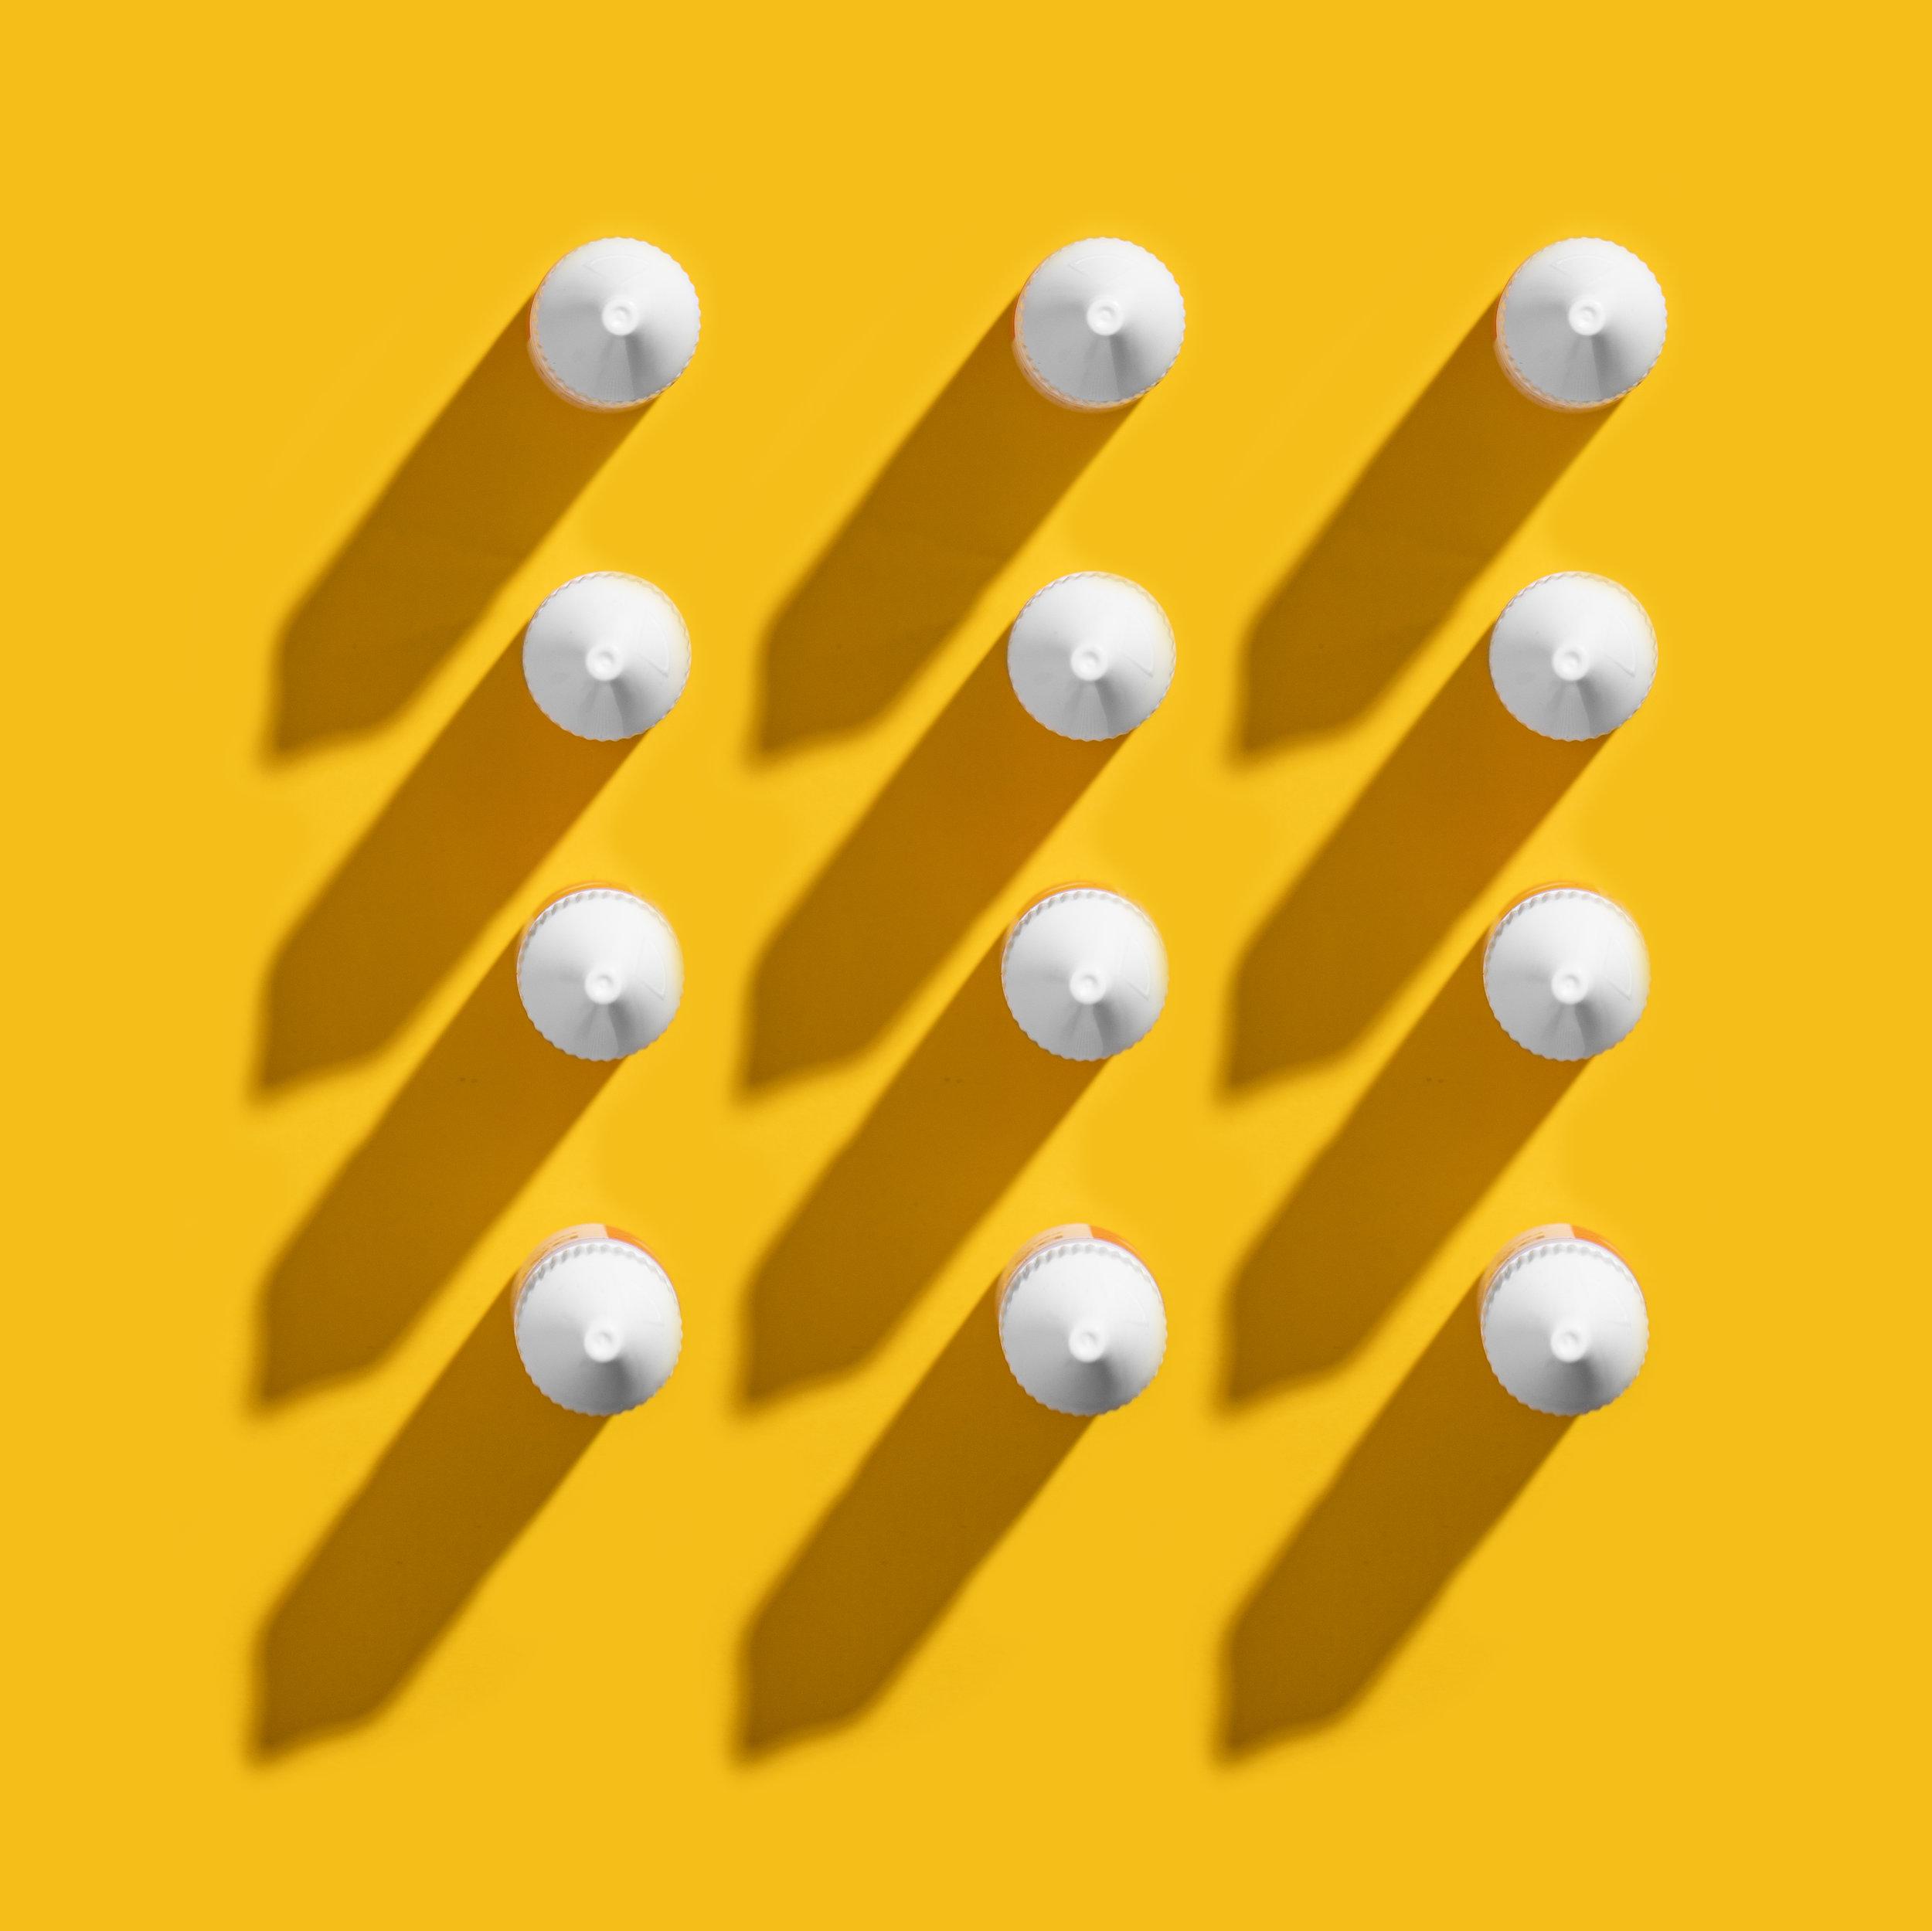 Baton-social-4-8.jpg